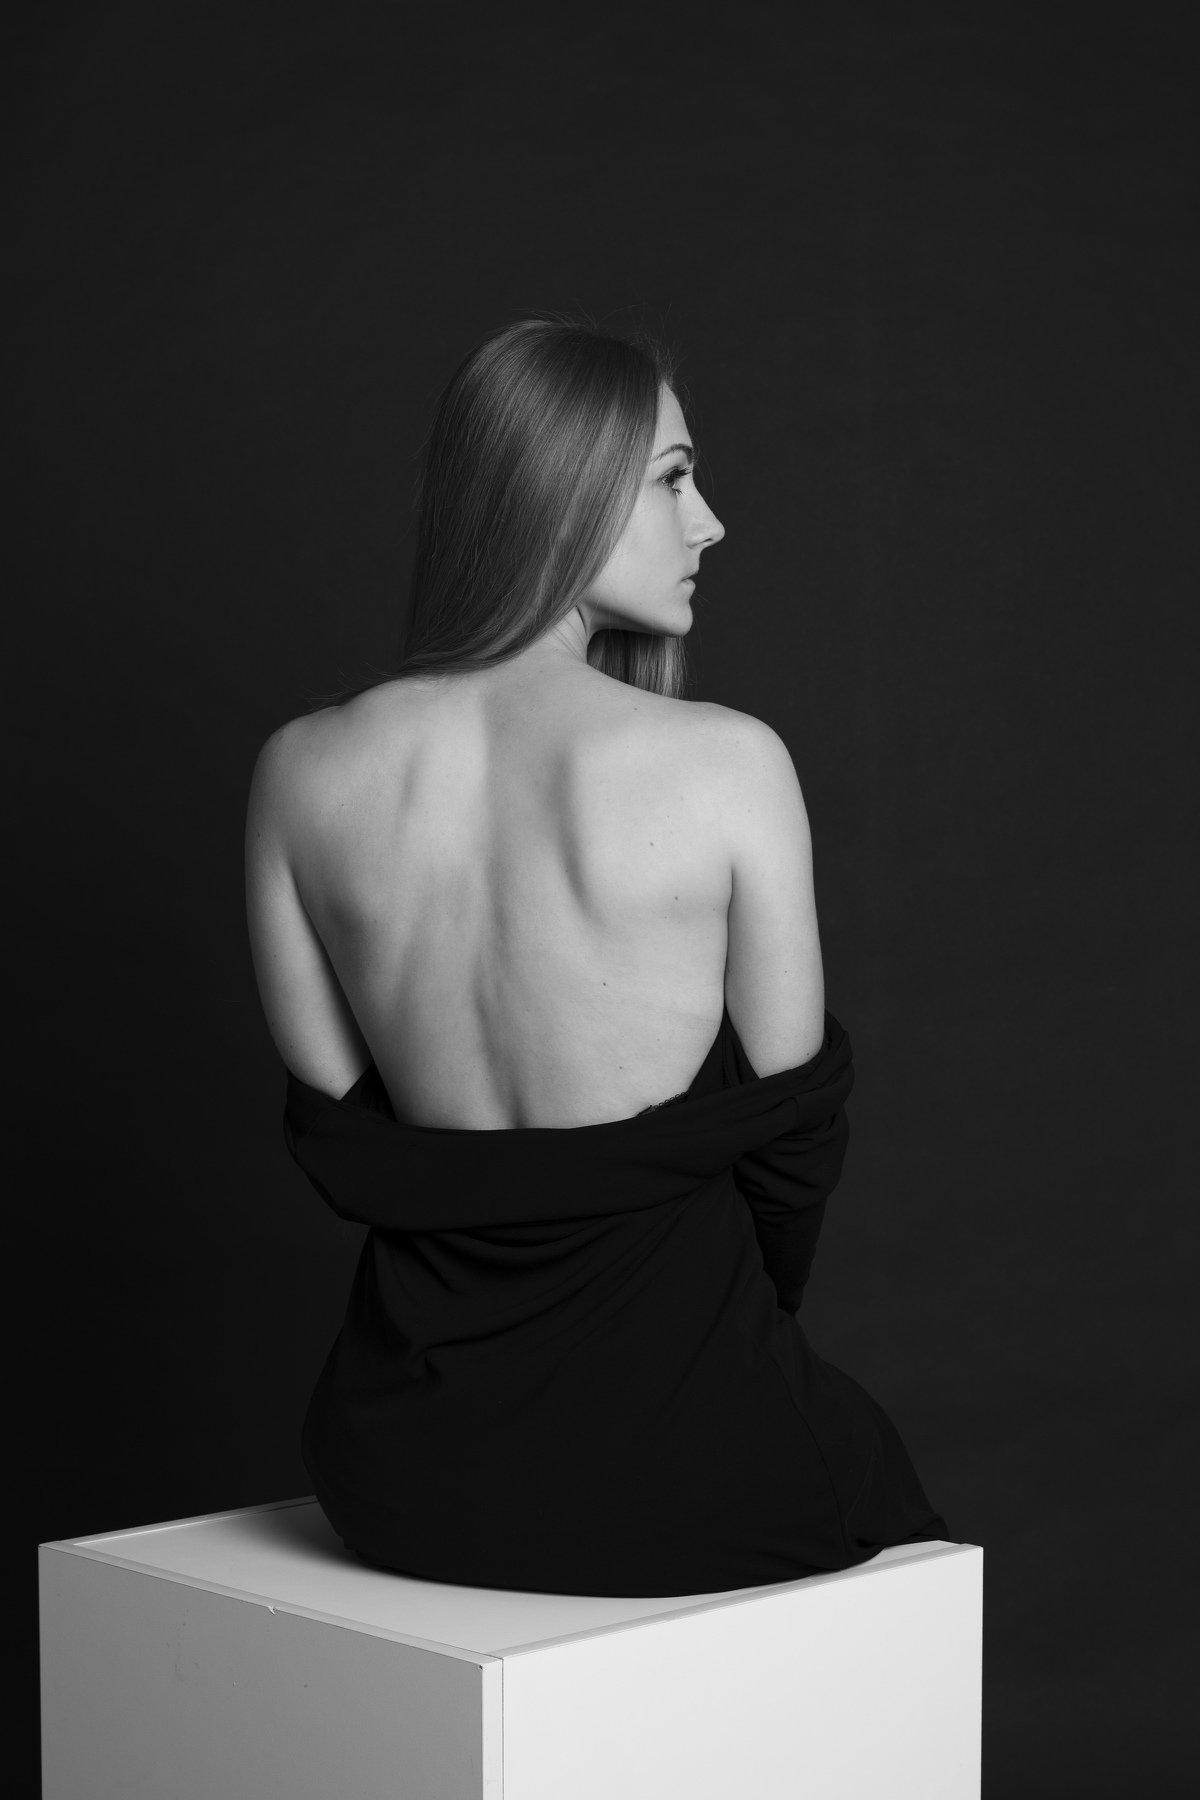 , Анастасия Павловская